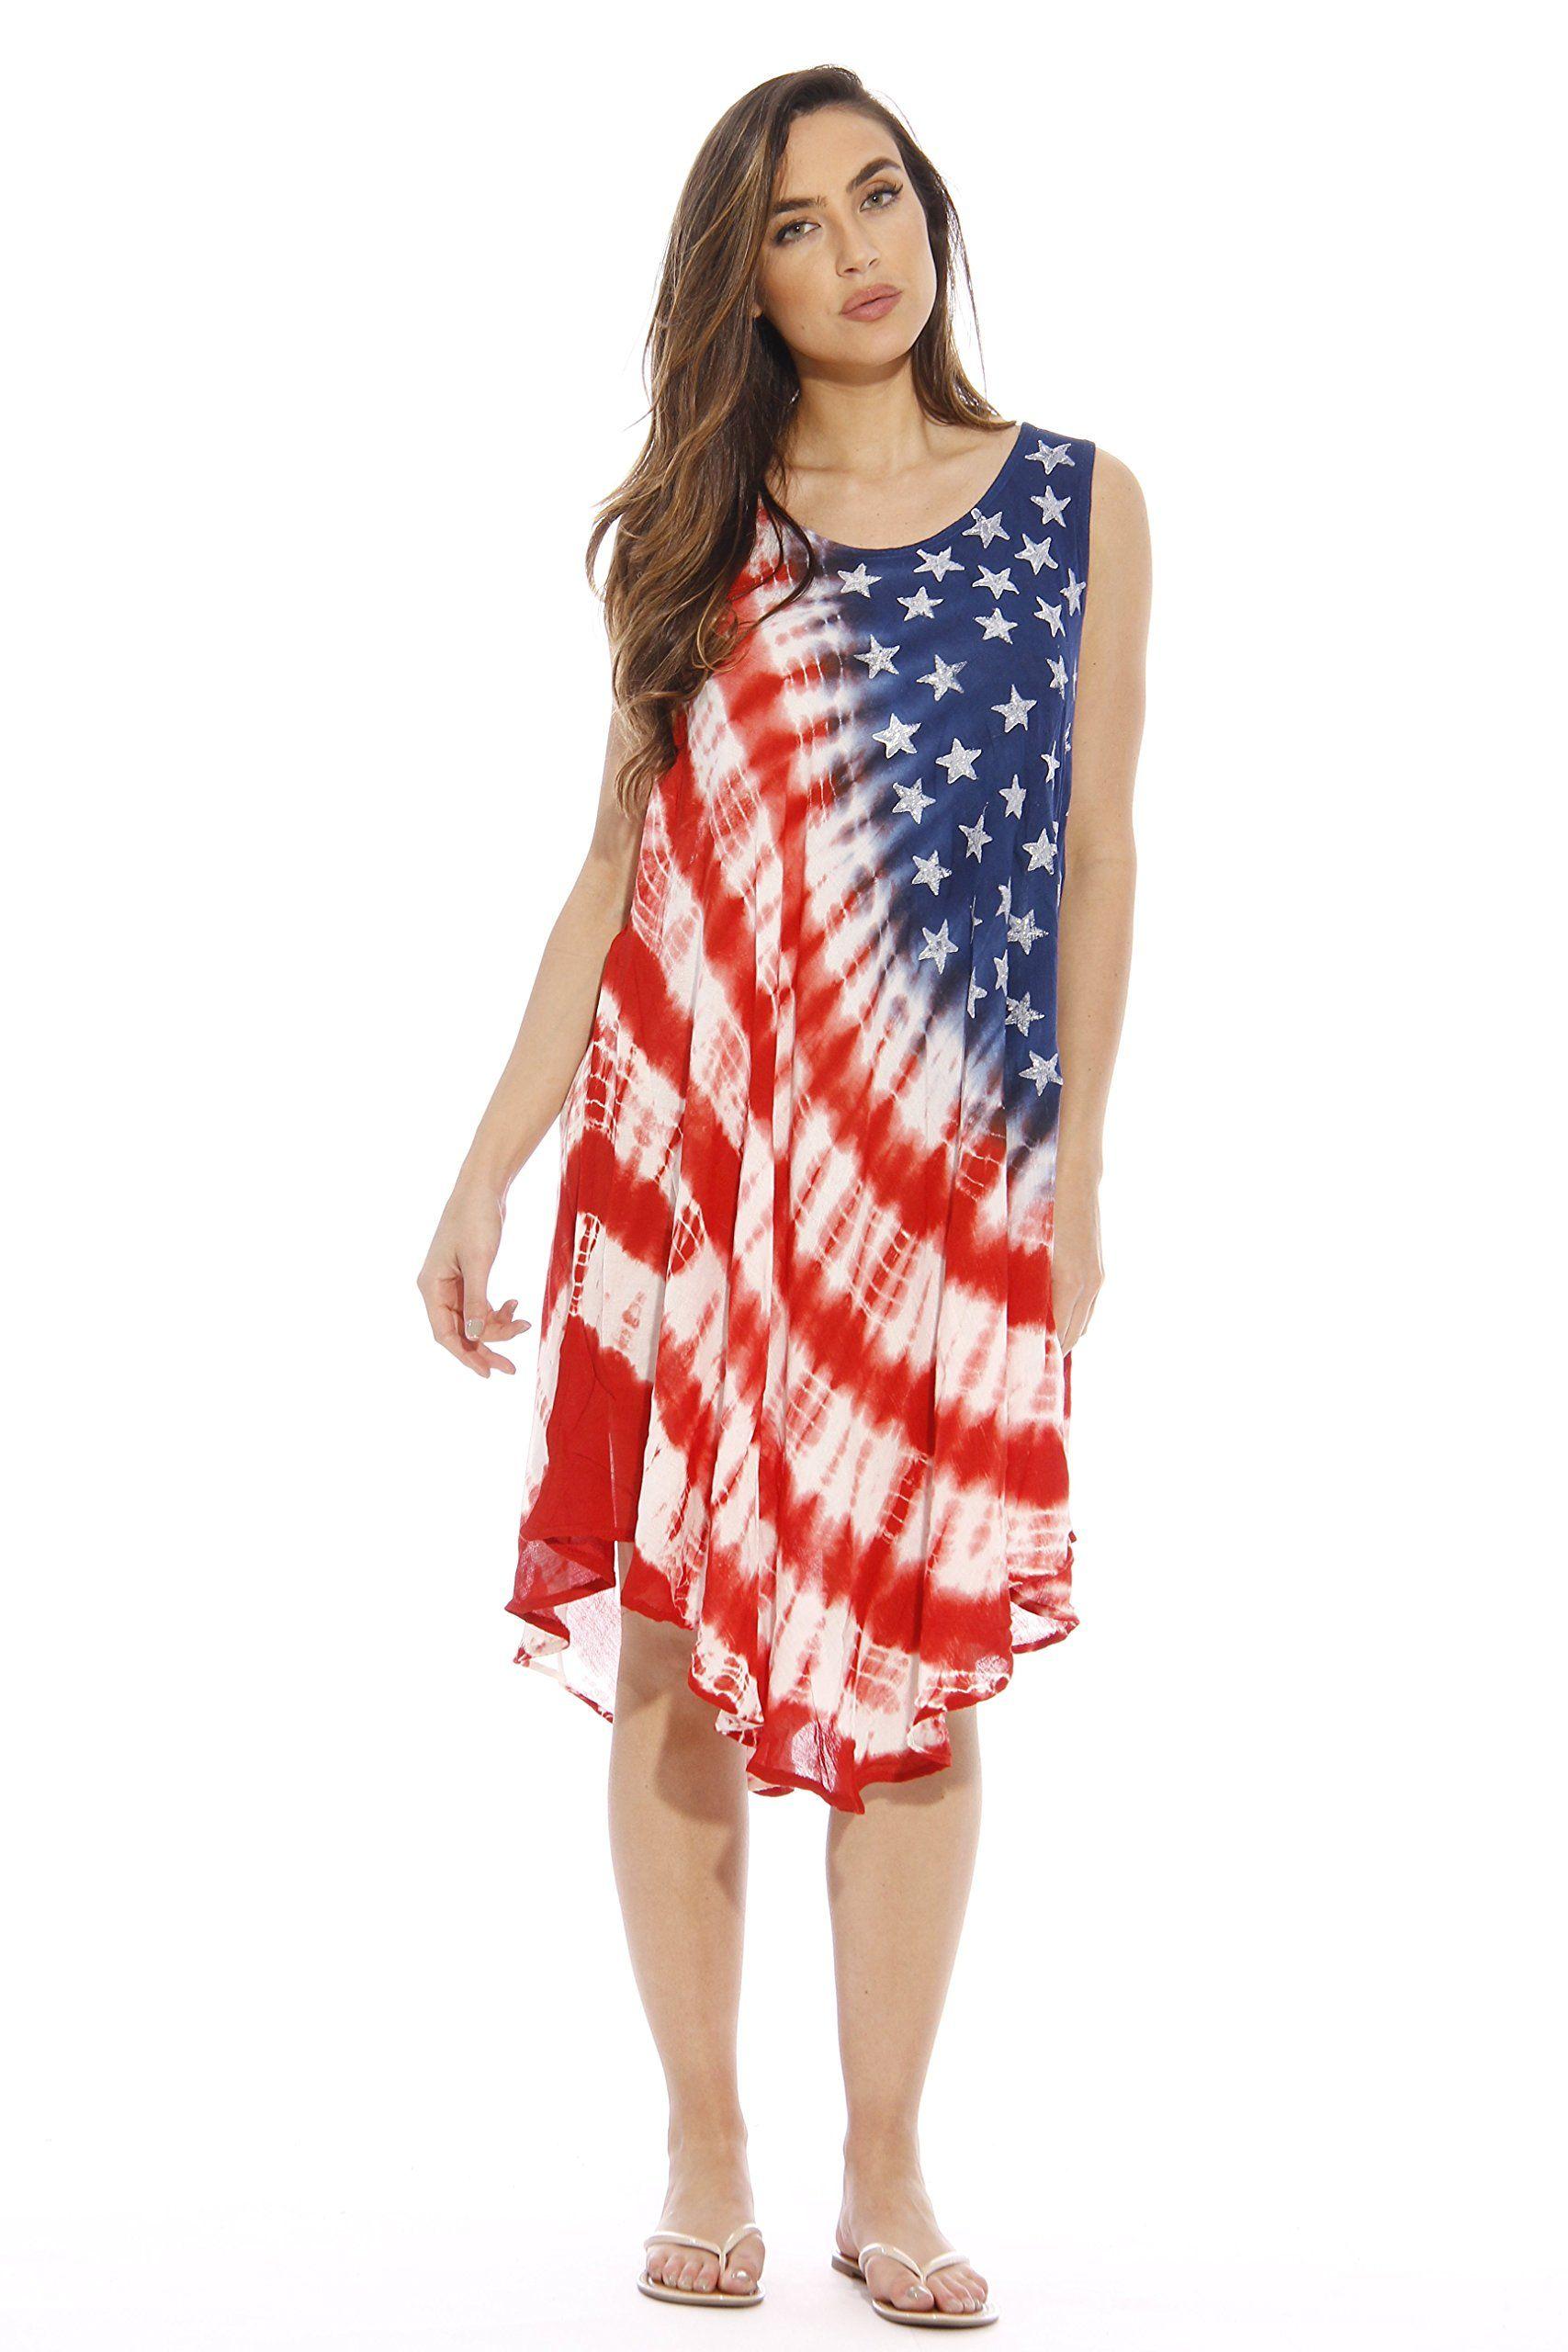 Riviera Sun American Flag Dress / Summer Dresses / Swimsuit ...